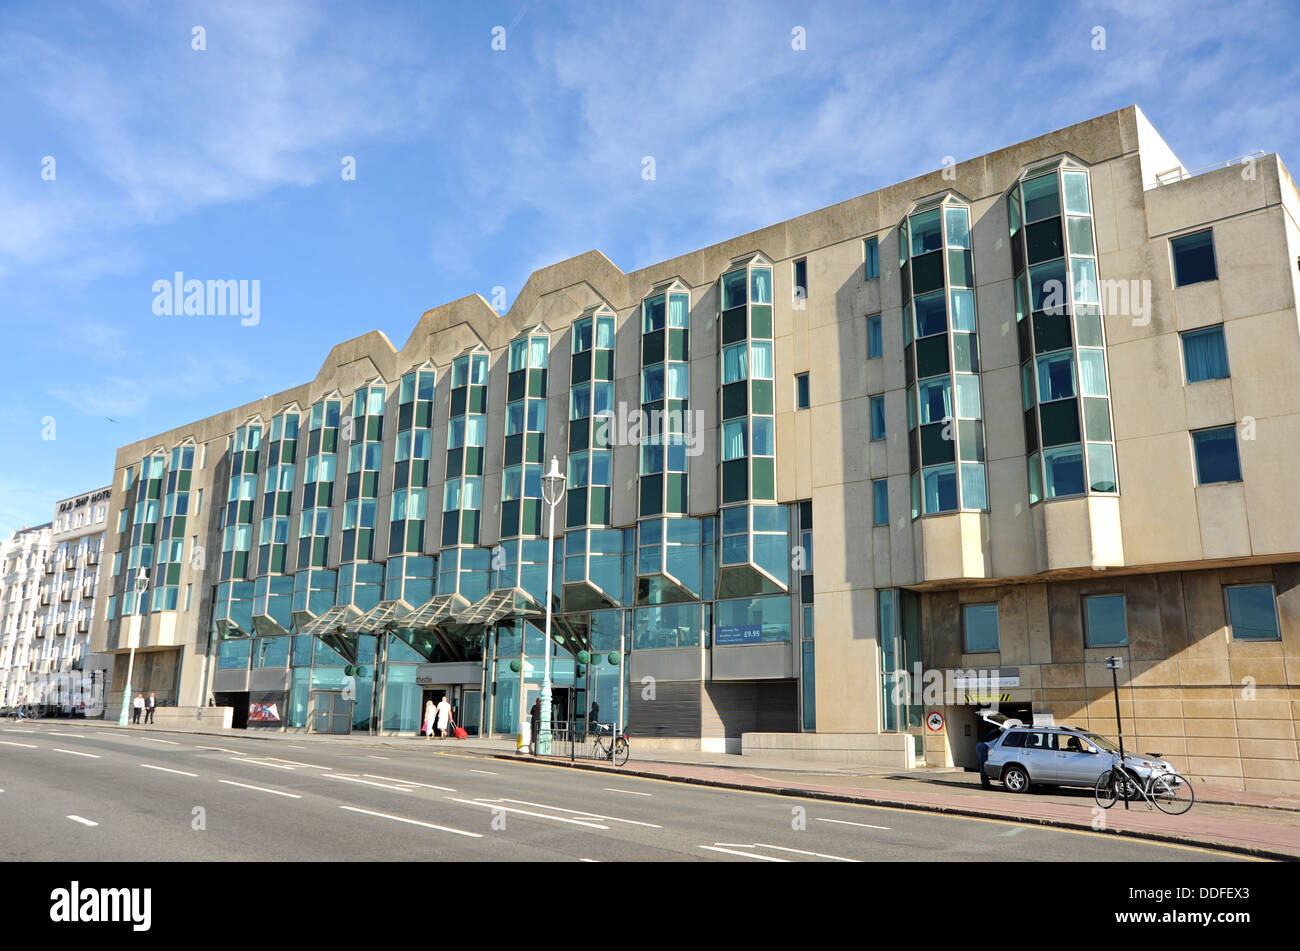 Thistle Hotel Brighton Stock Photos Thistle Hotel Brighton Stock Images Alamy